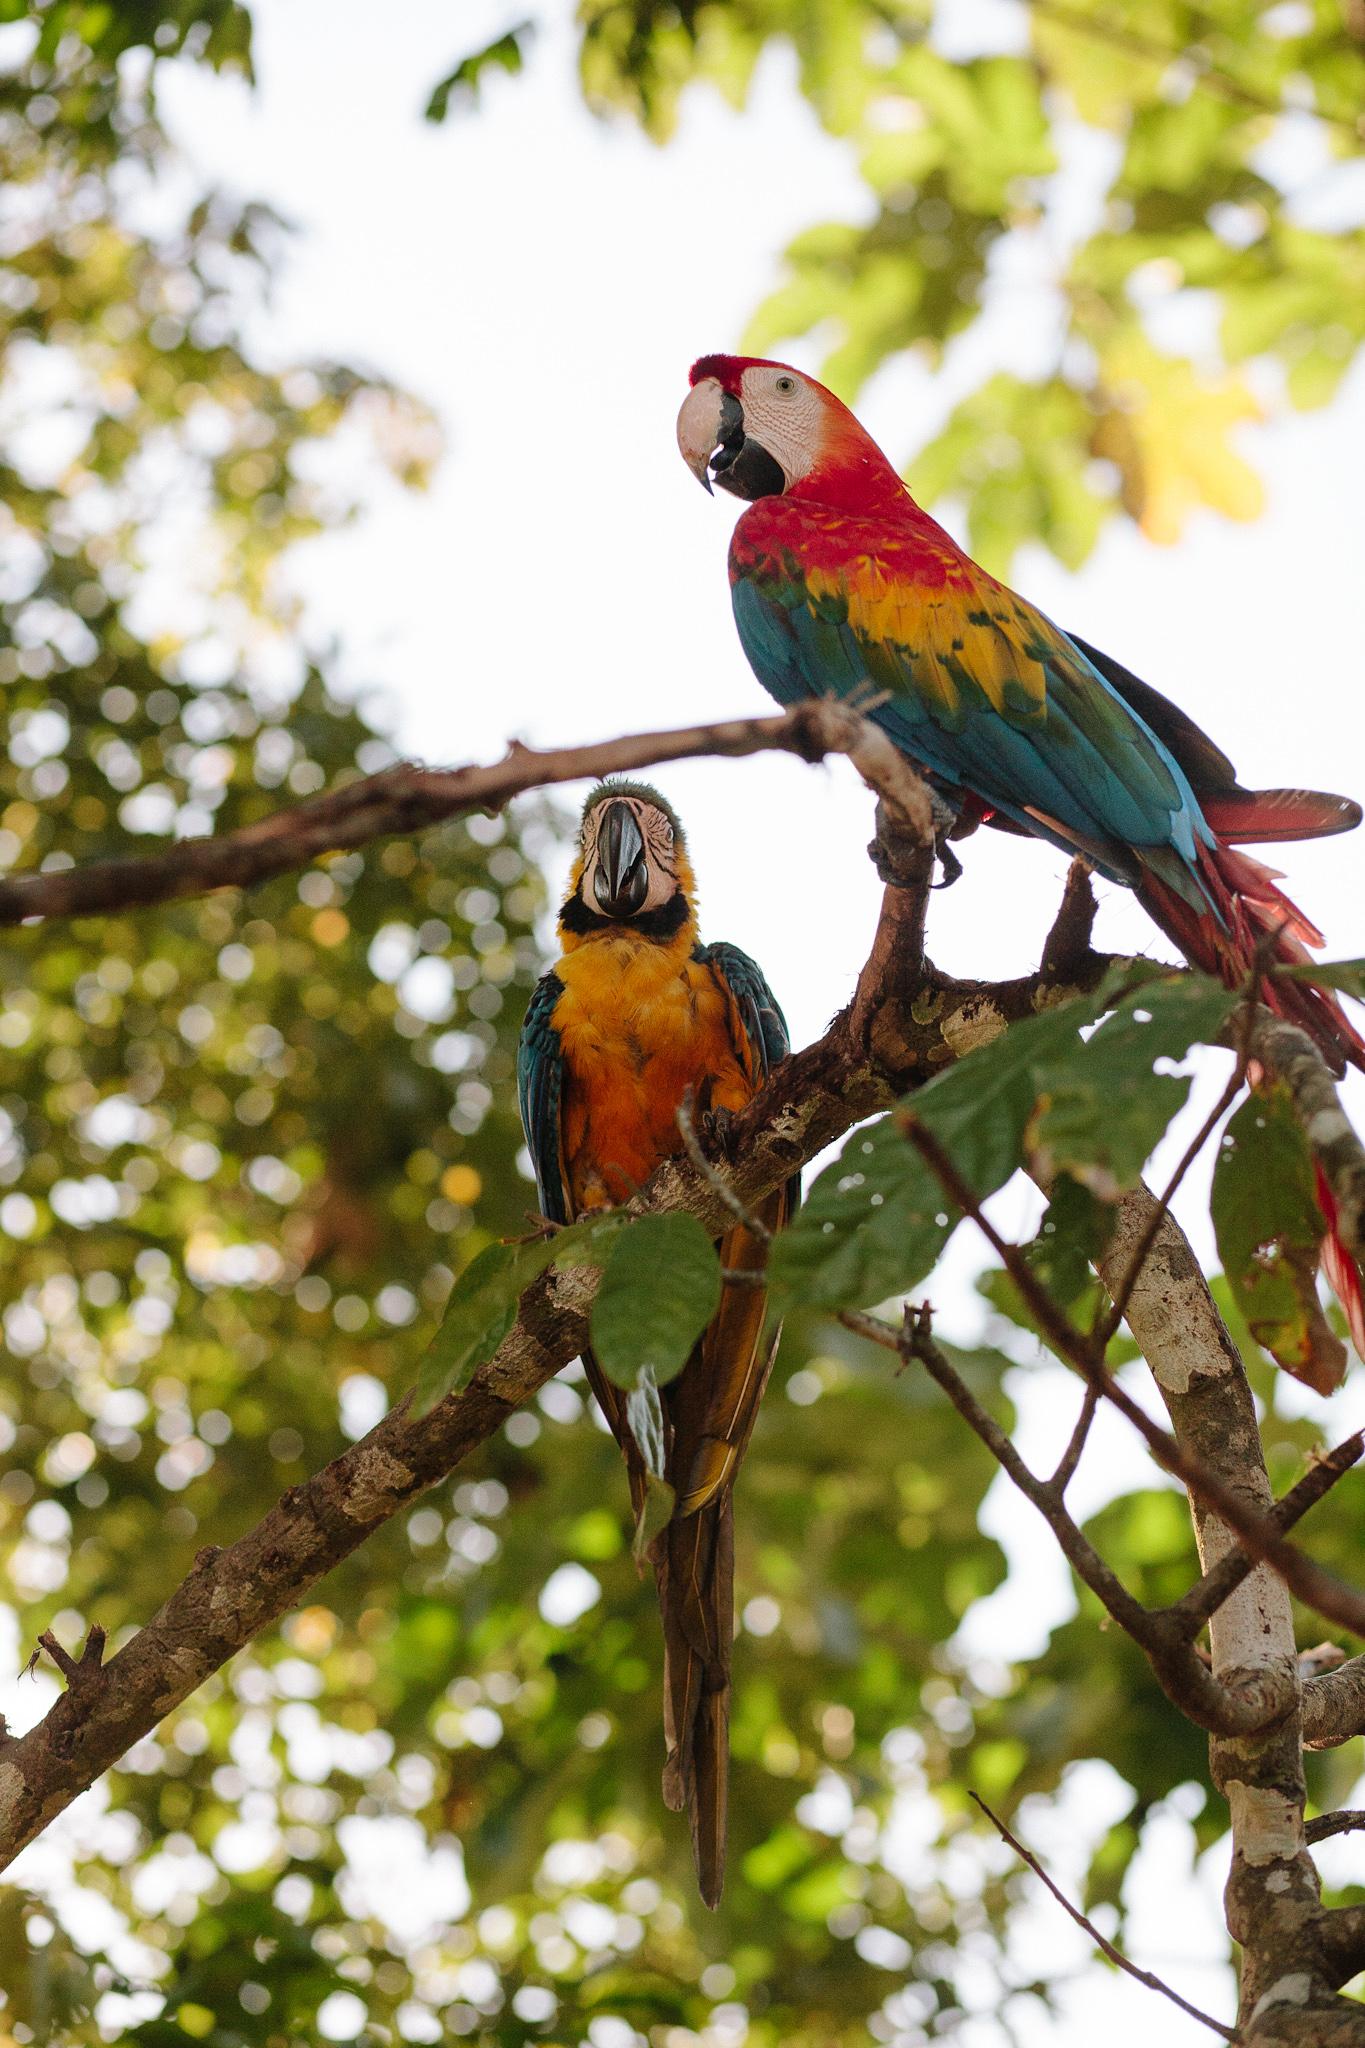 EcuadorQuito&Amazon_forwebsite2015_Jan2010_jenniferleahy-052.jpg